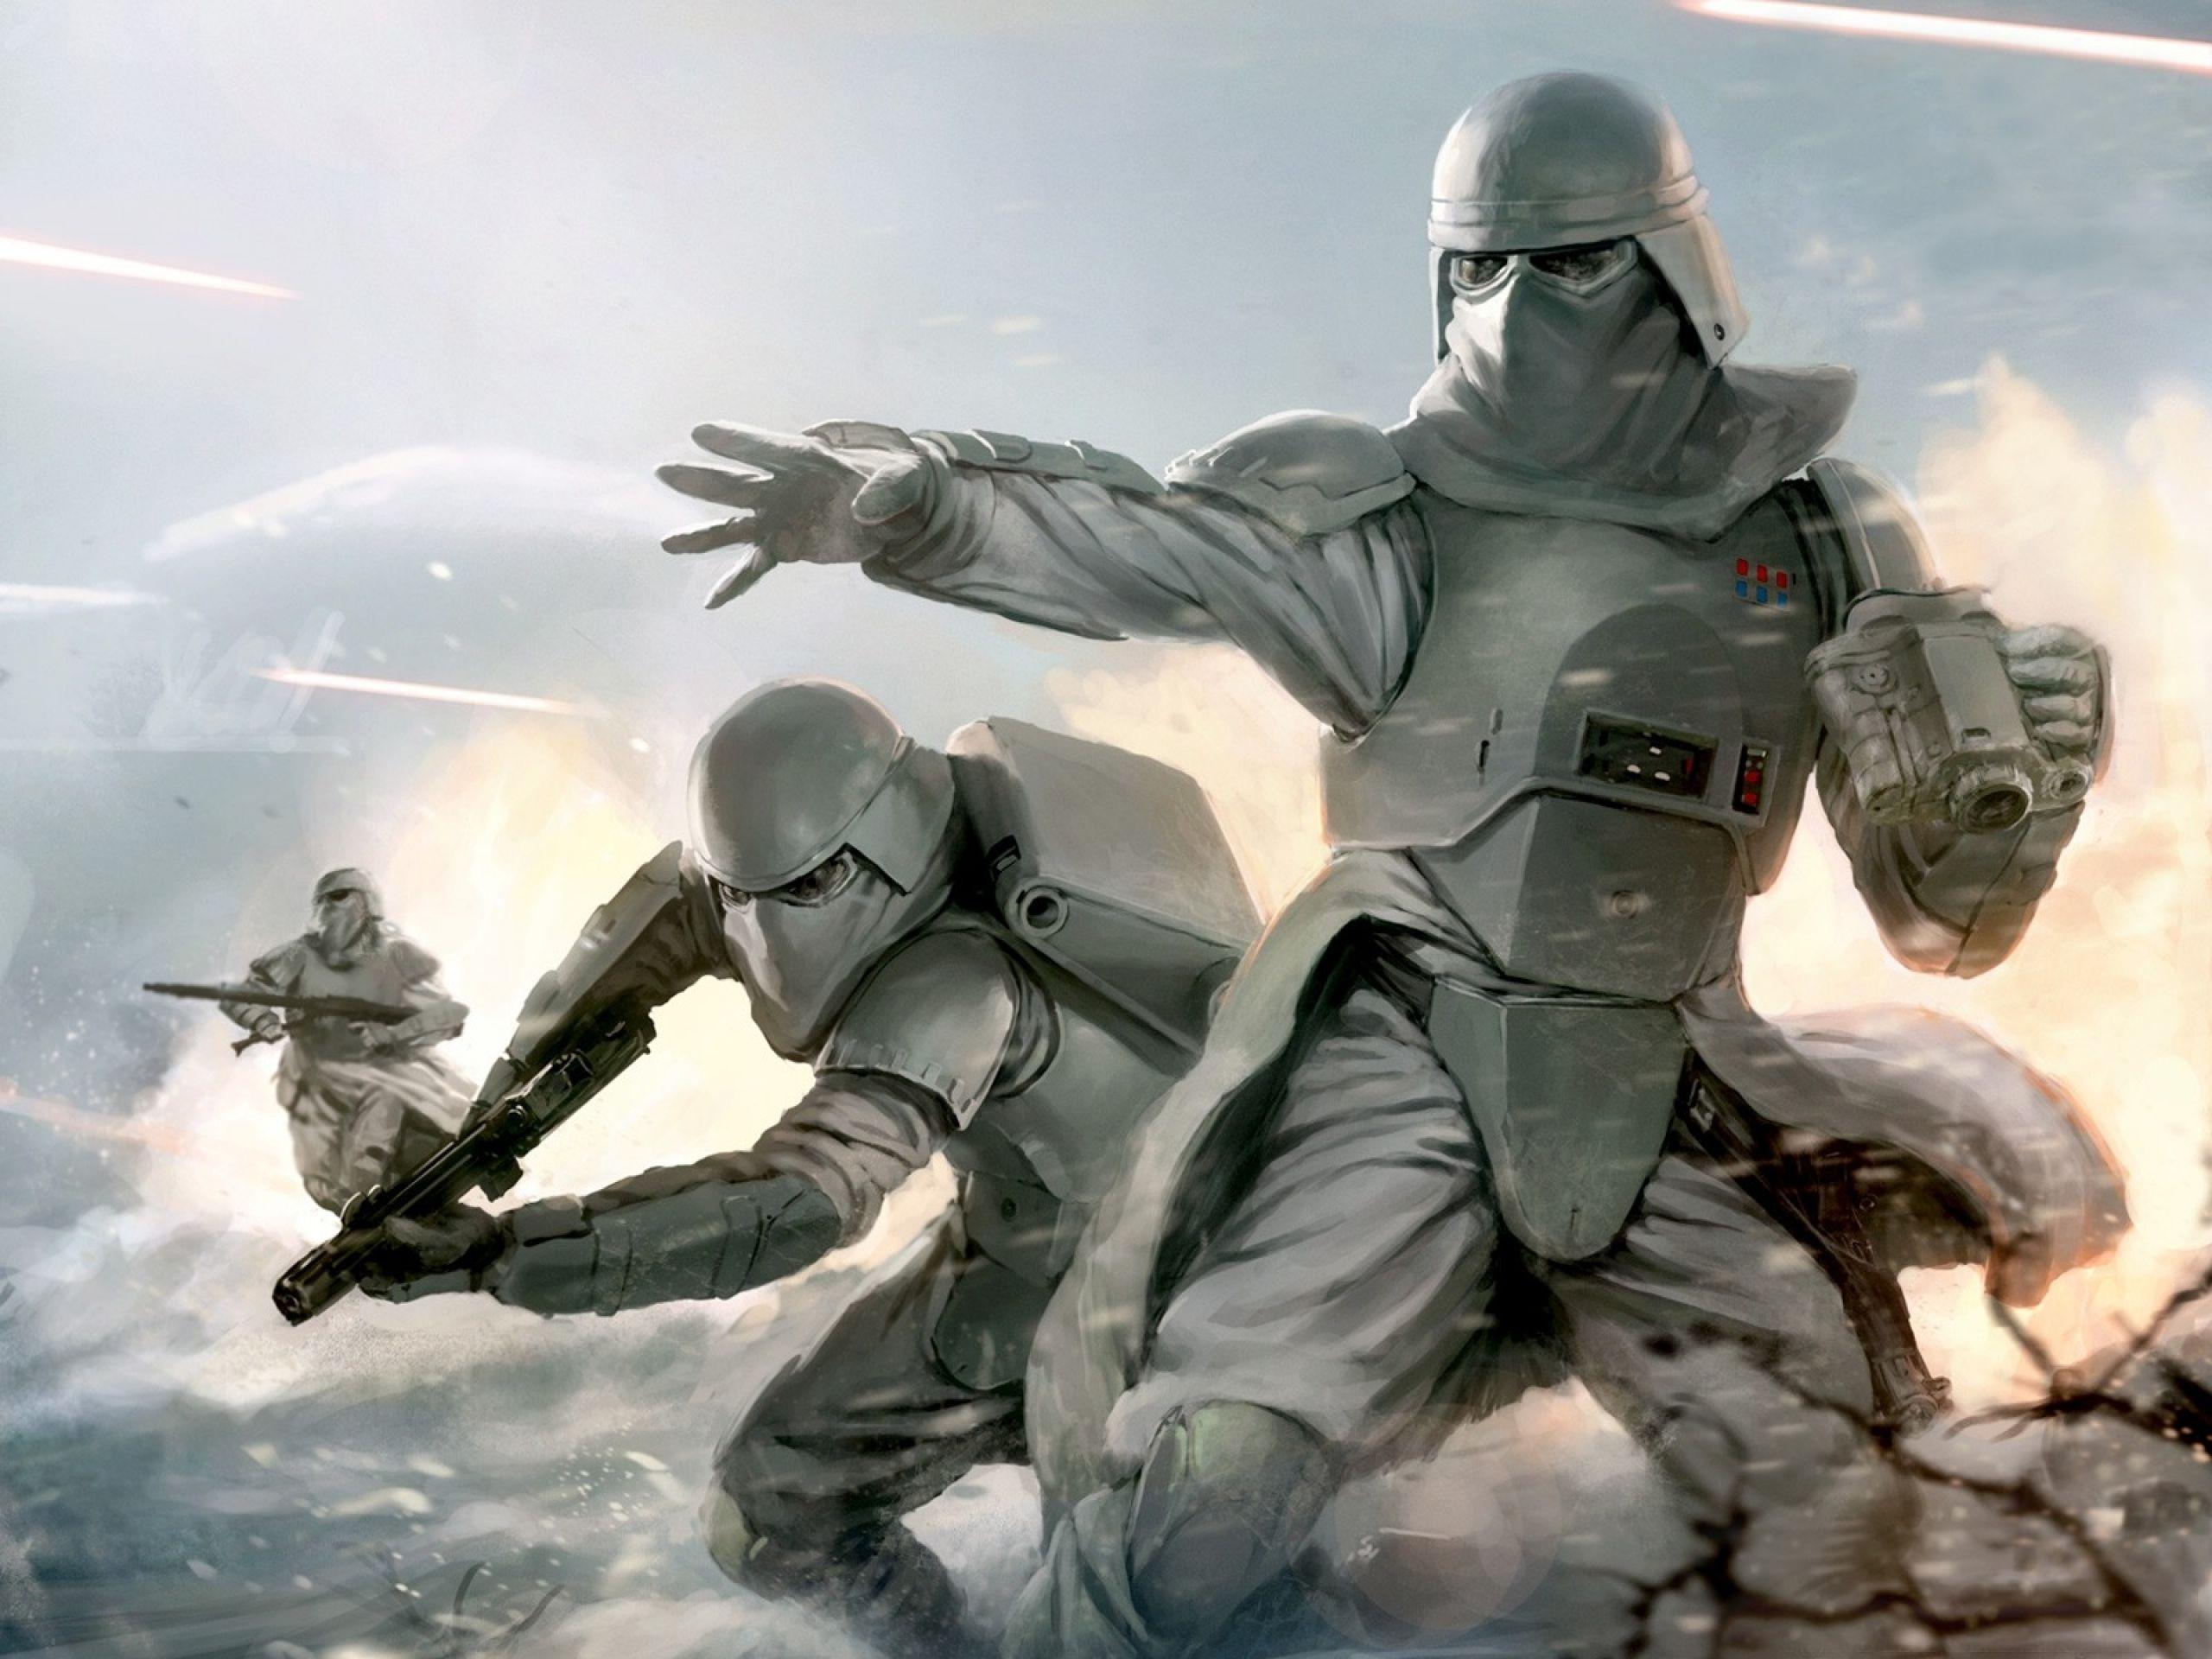 Stormtroopers @ Hoth Battle | Star Wars | Pinterest